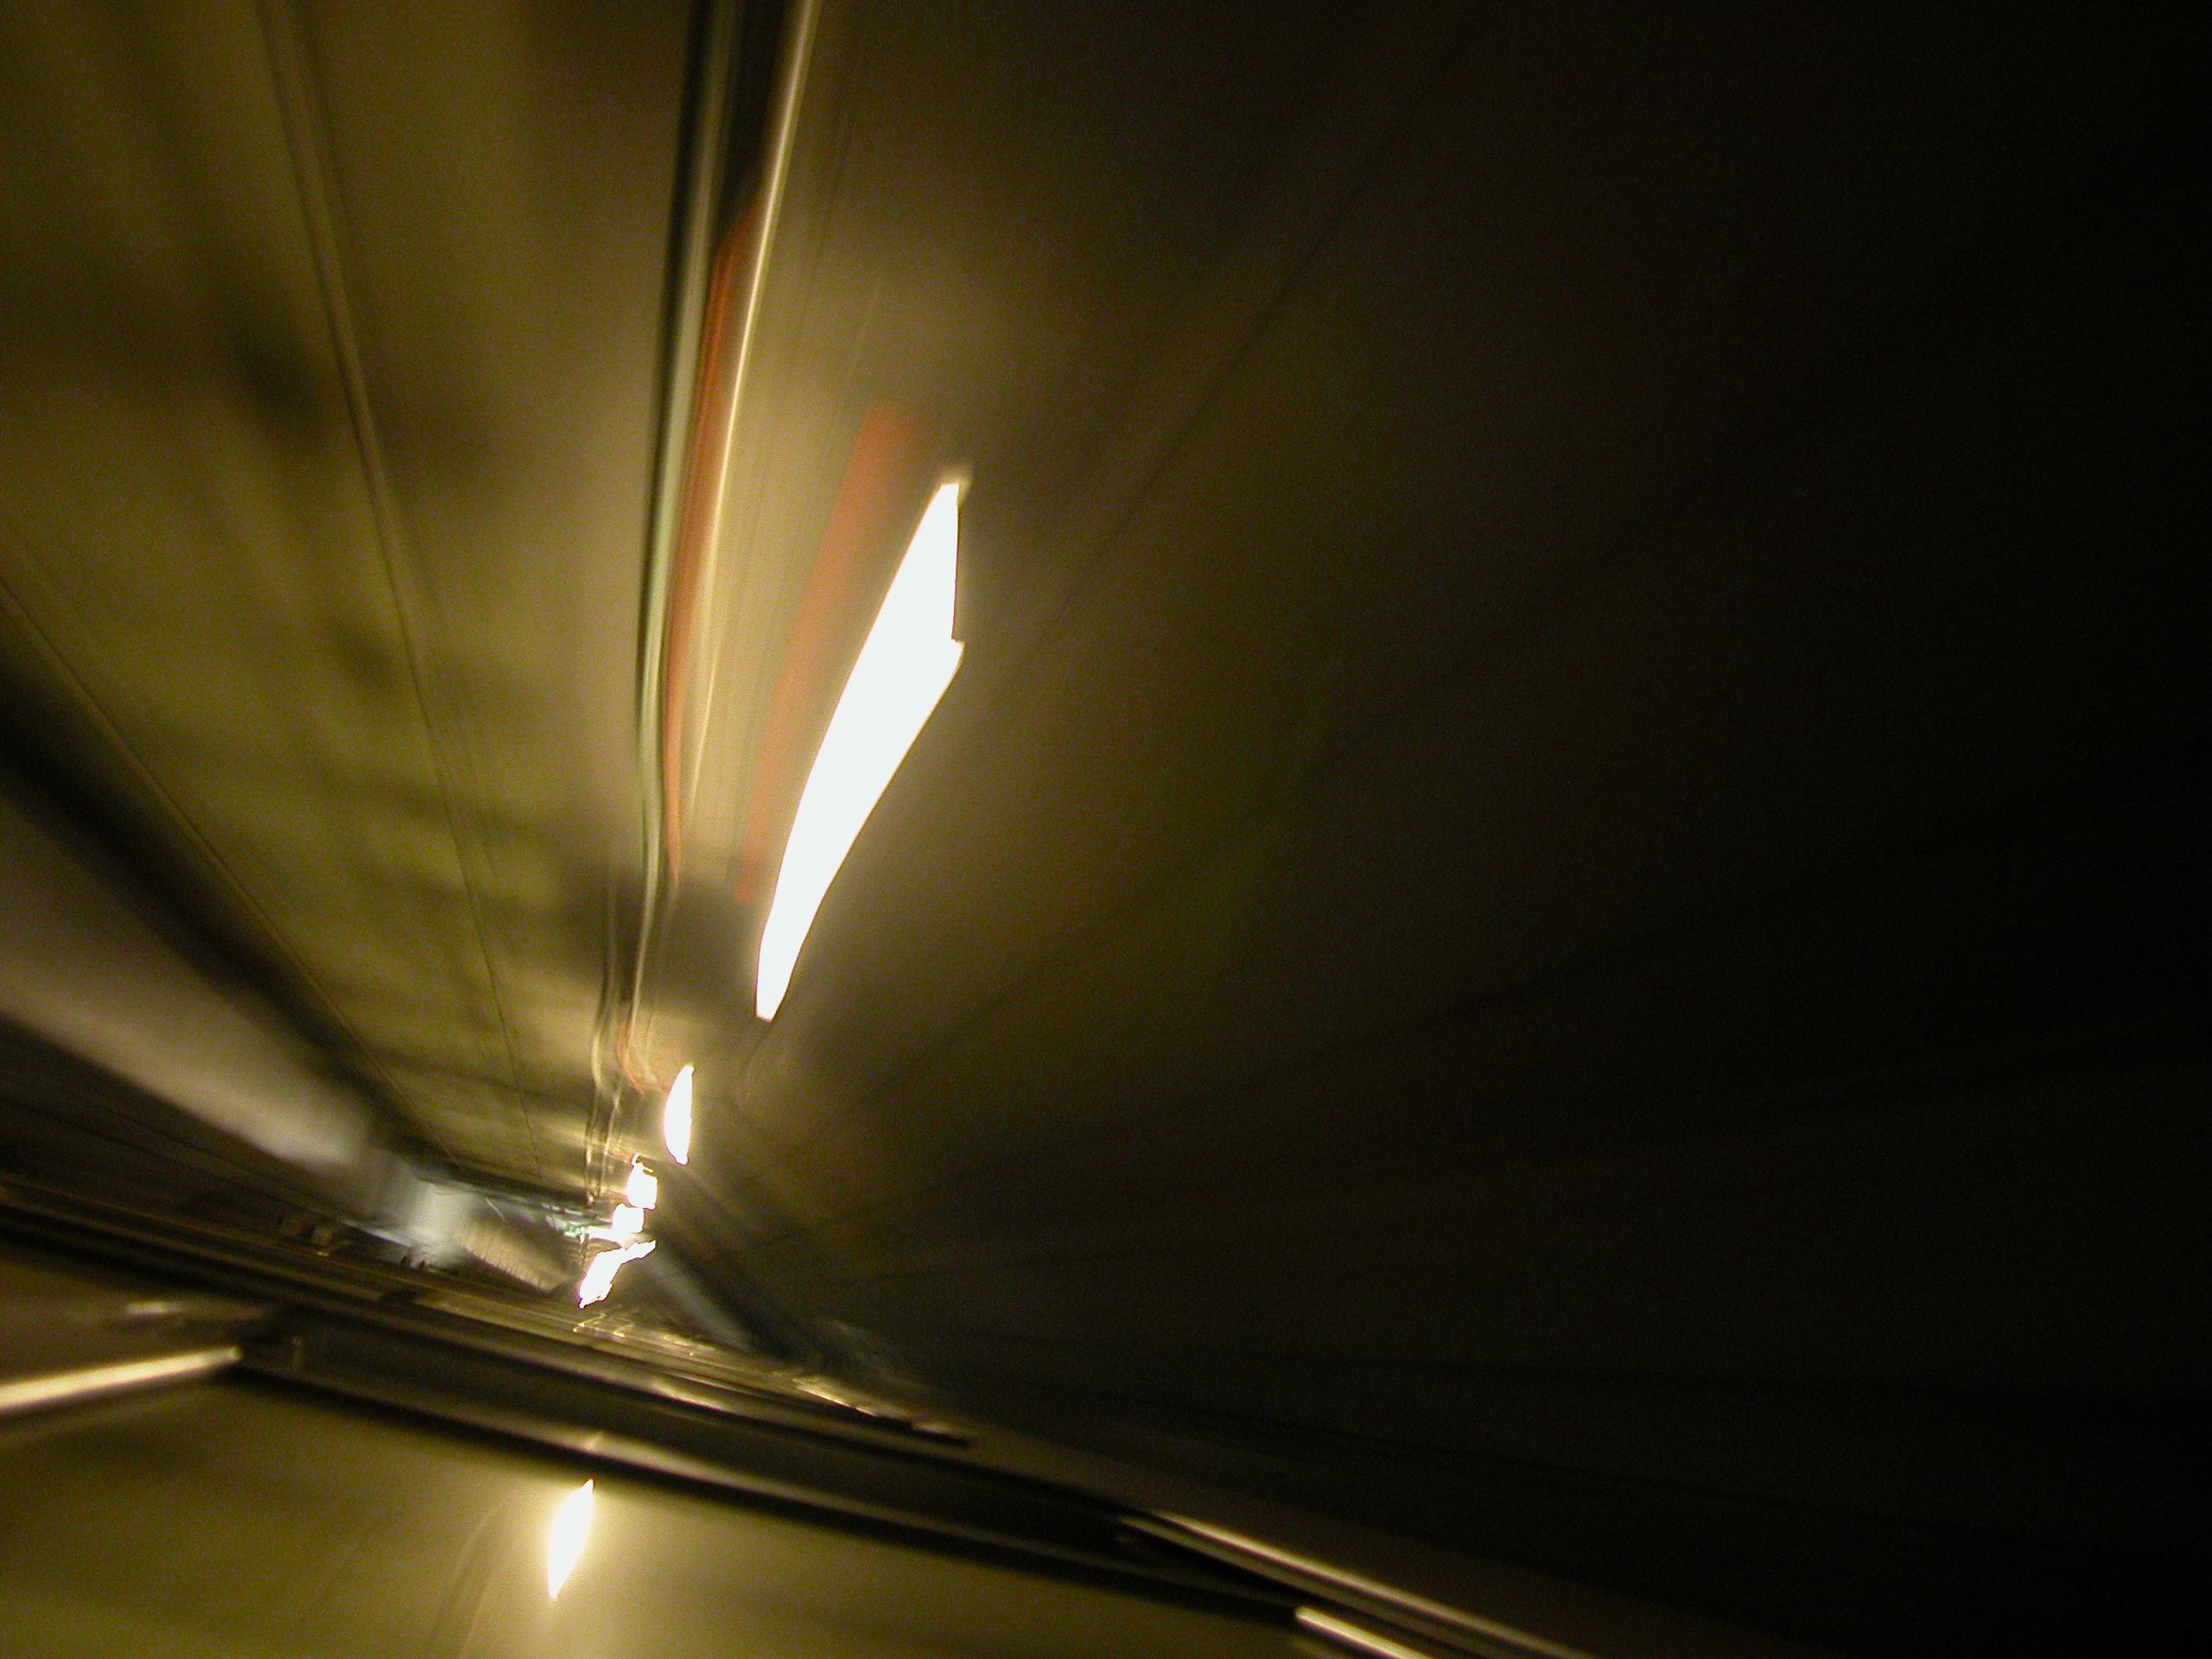 high speed lights tunnel traveling hyperspace isn't like dustin' crops boy!